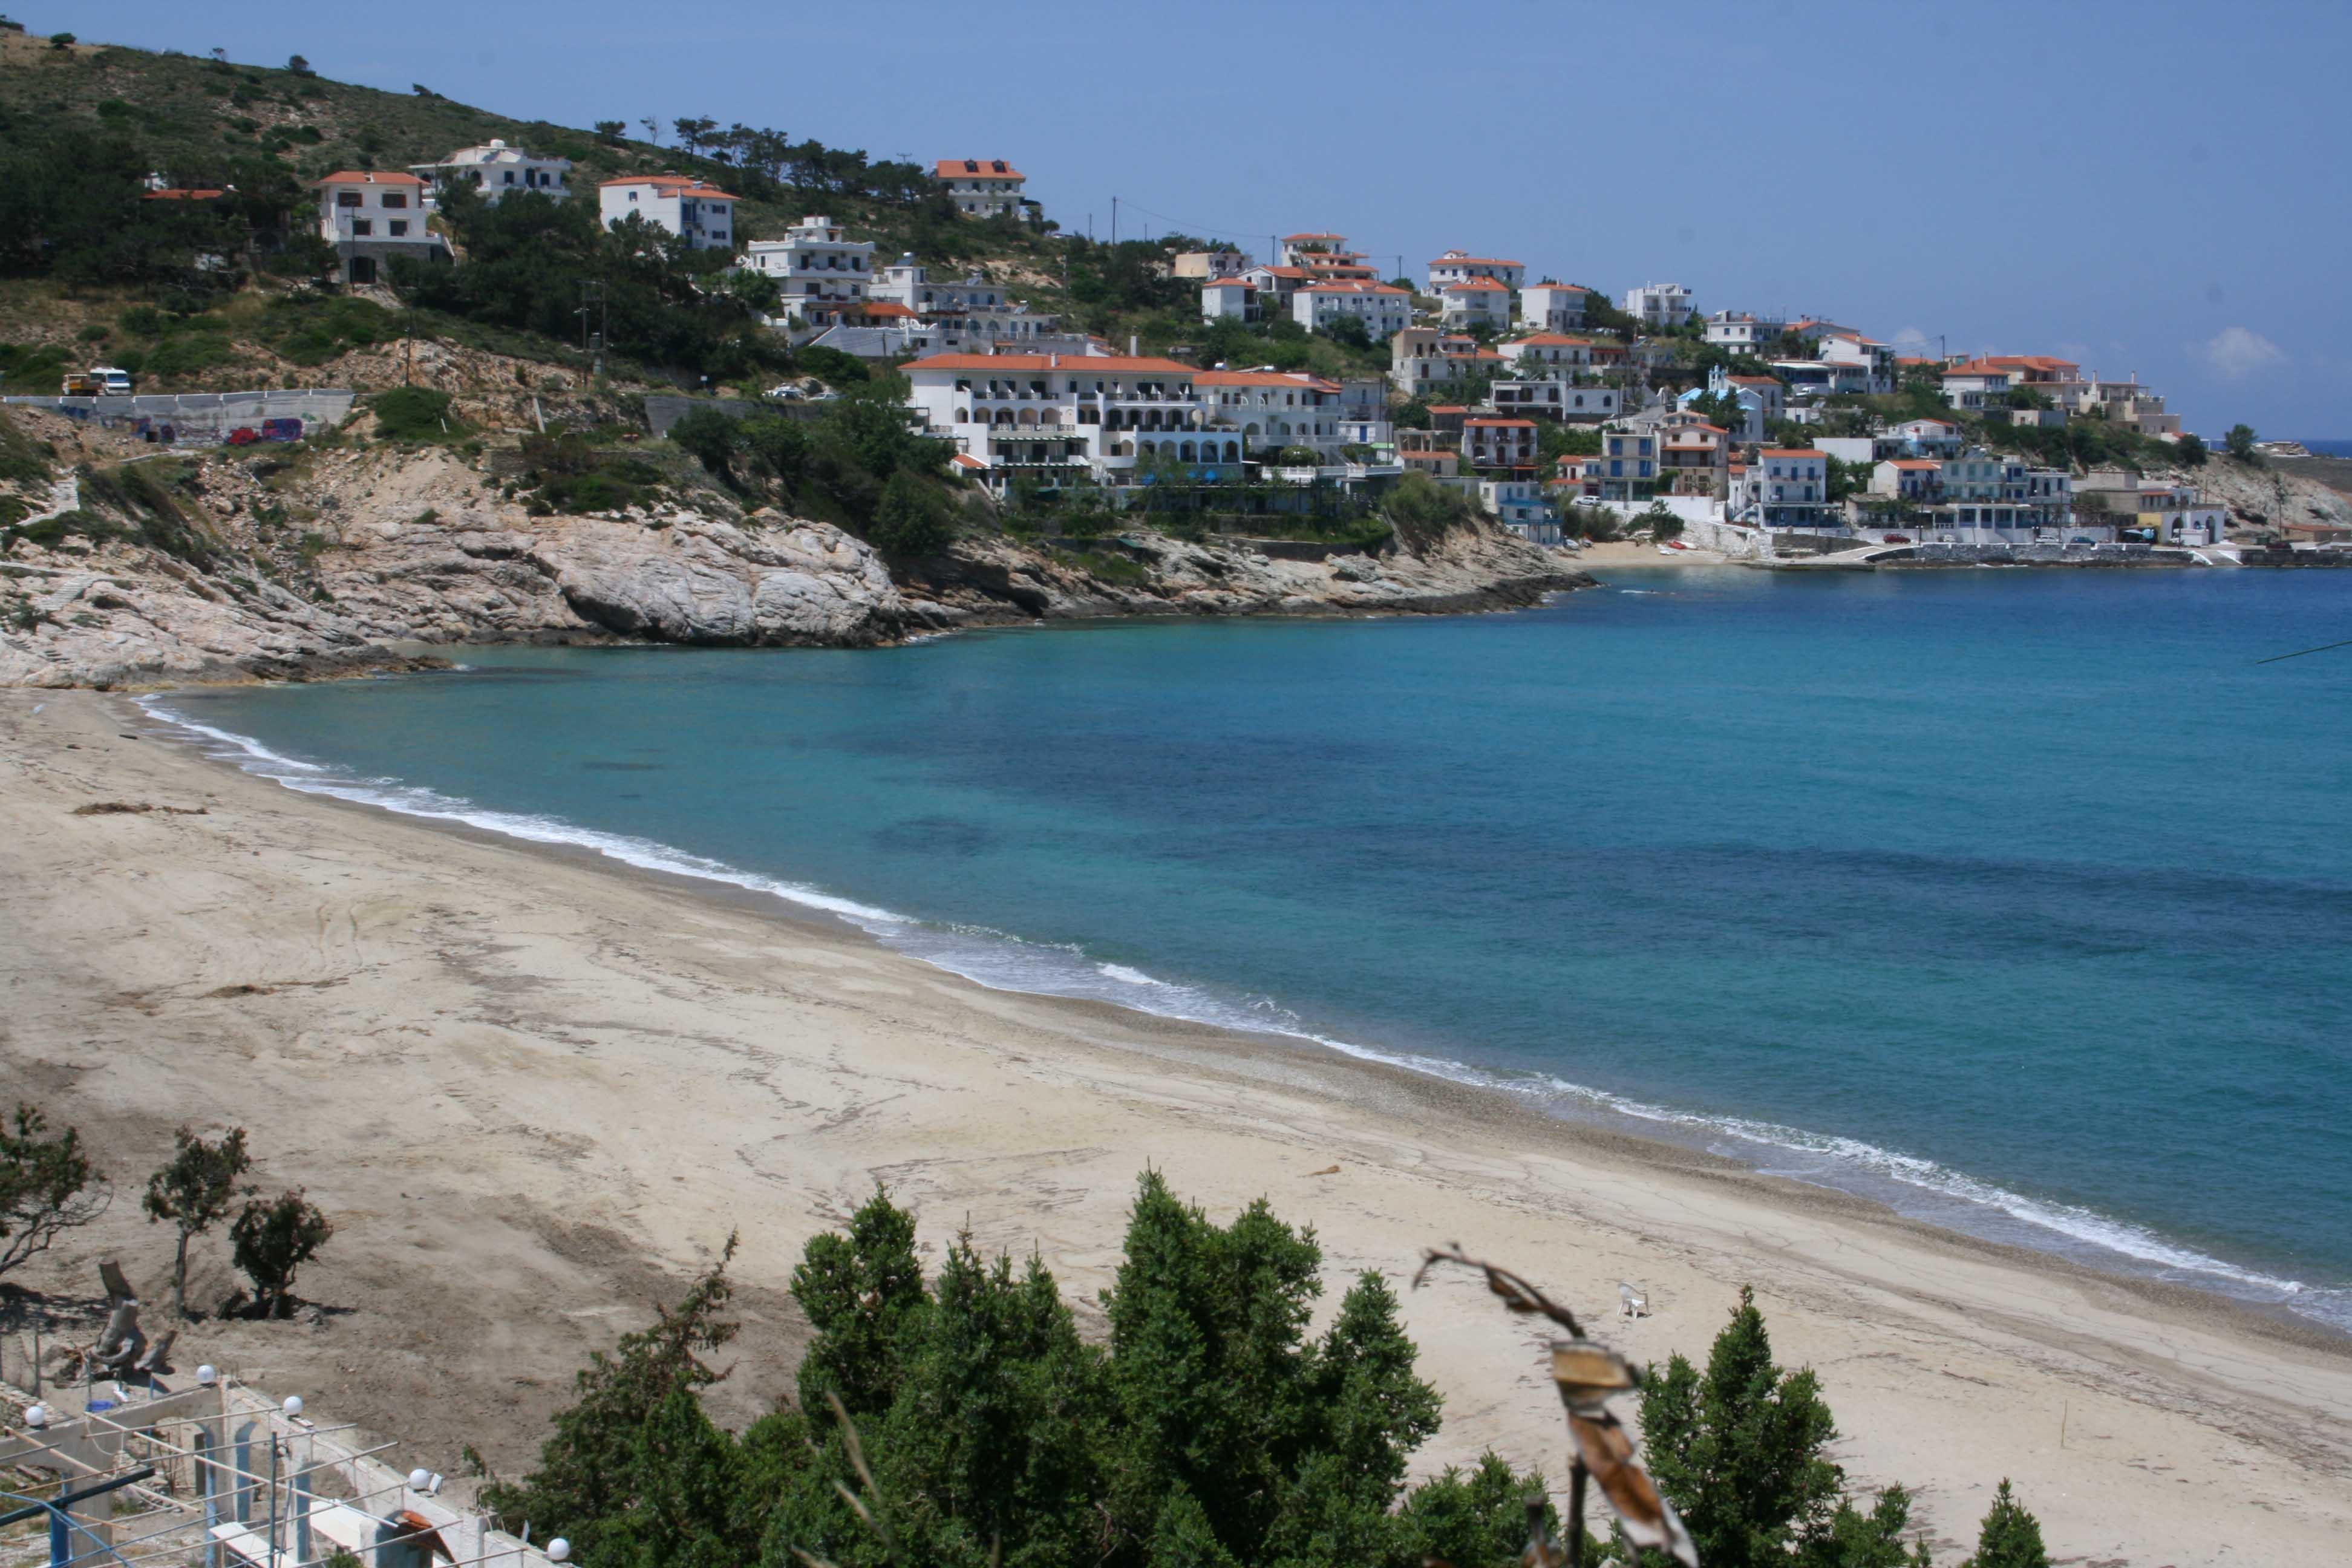 plage ikaria livadi près d'armenistis grece